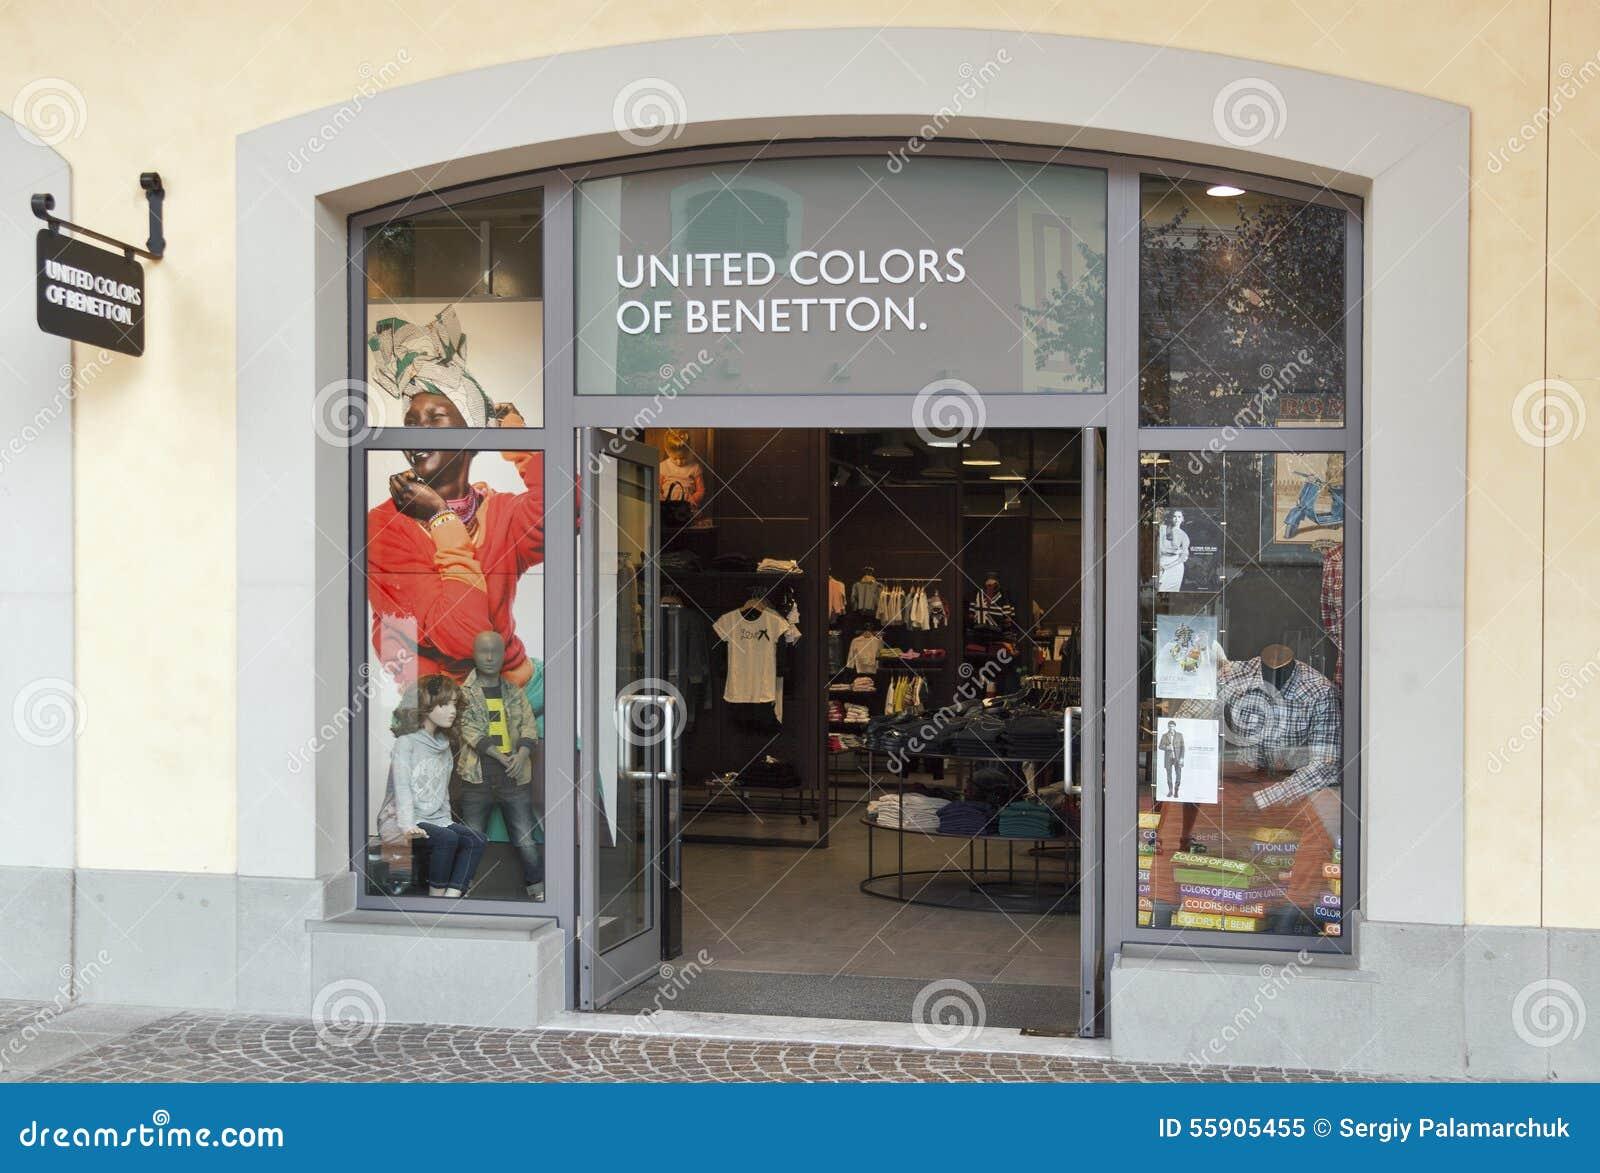 McArthurGlen Designer Outlet Barberino In Italy Editorial Image ...